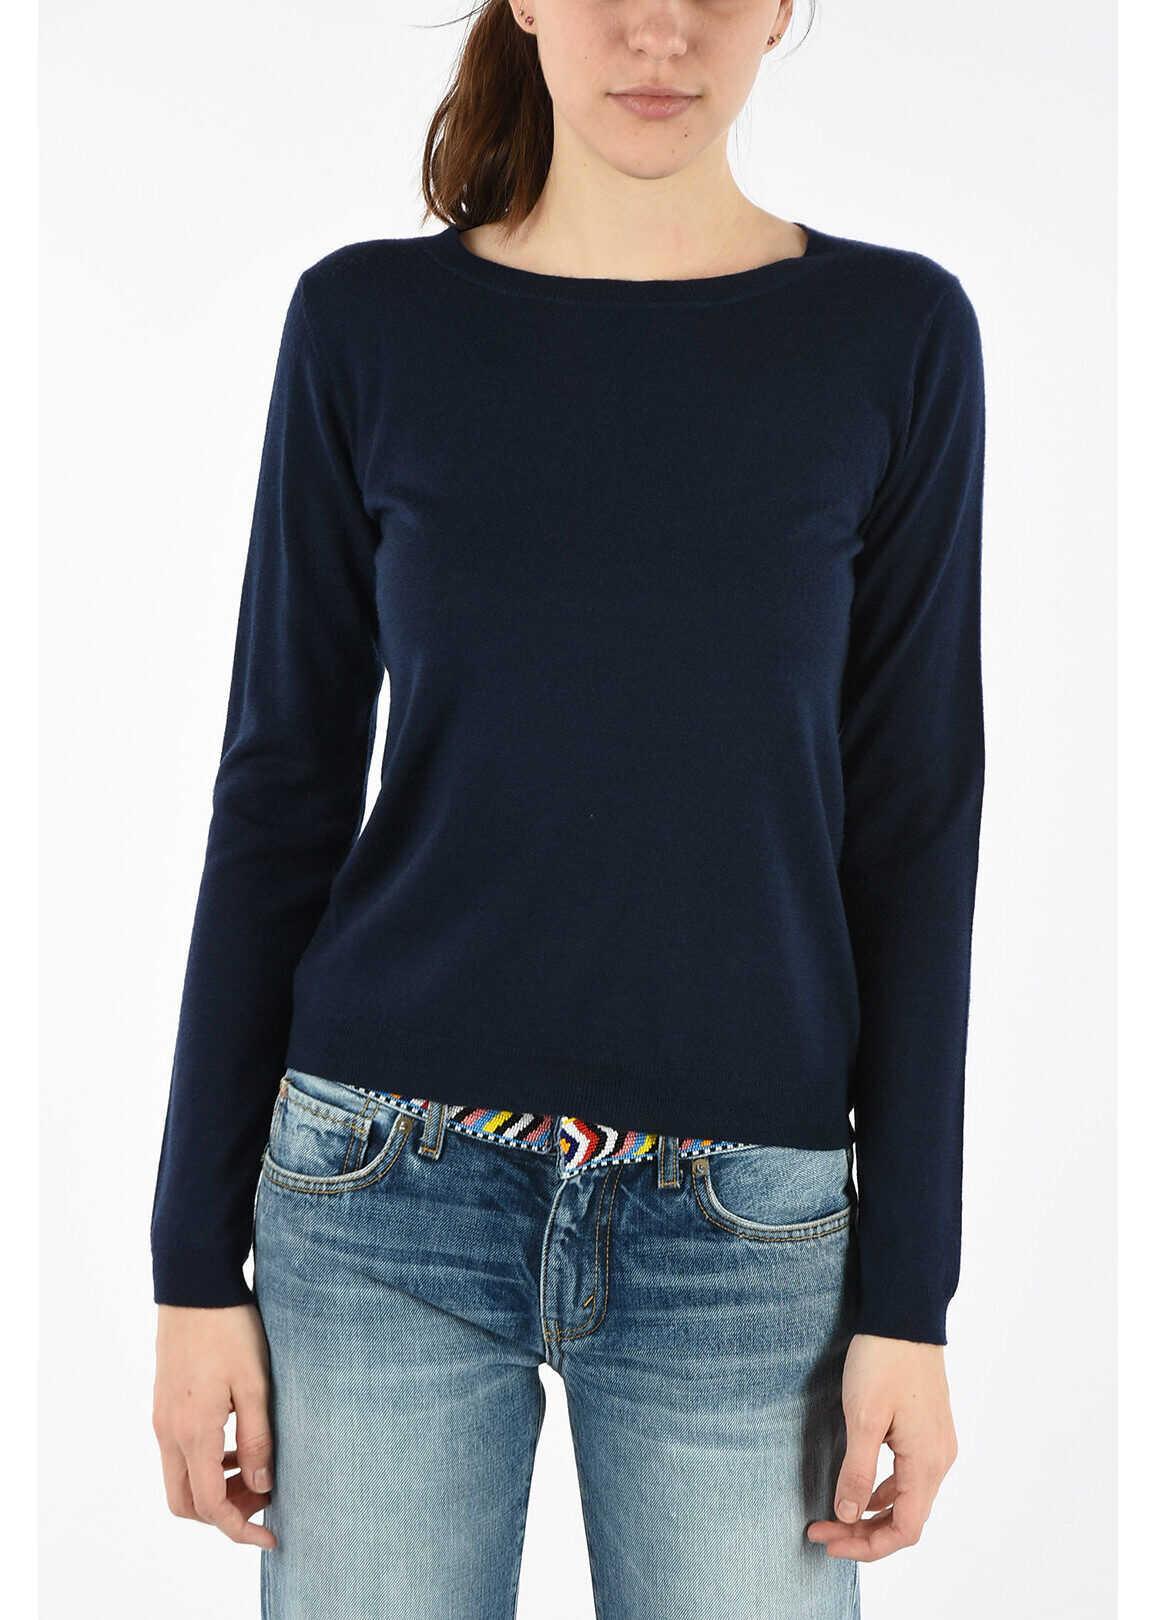 P.A.R.O.S.H. cashmere crew-neck sweater BLUE